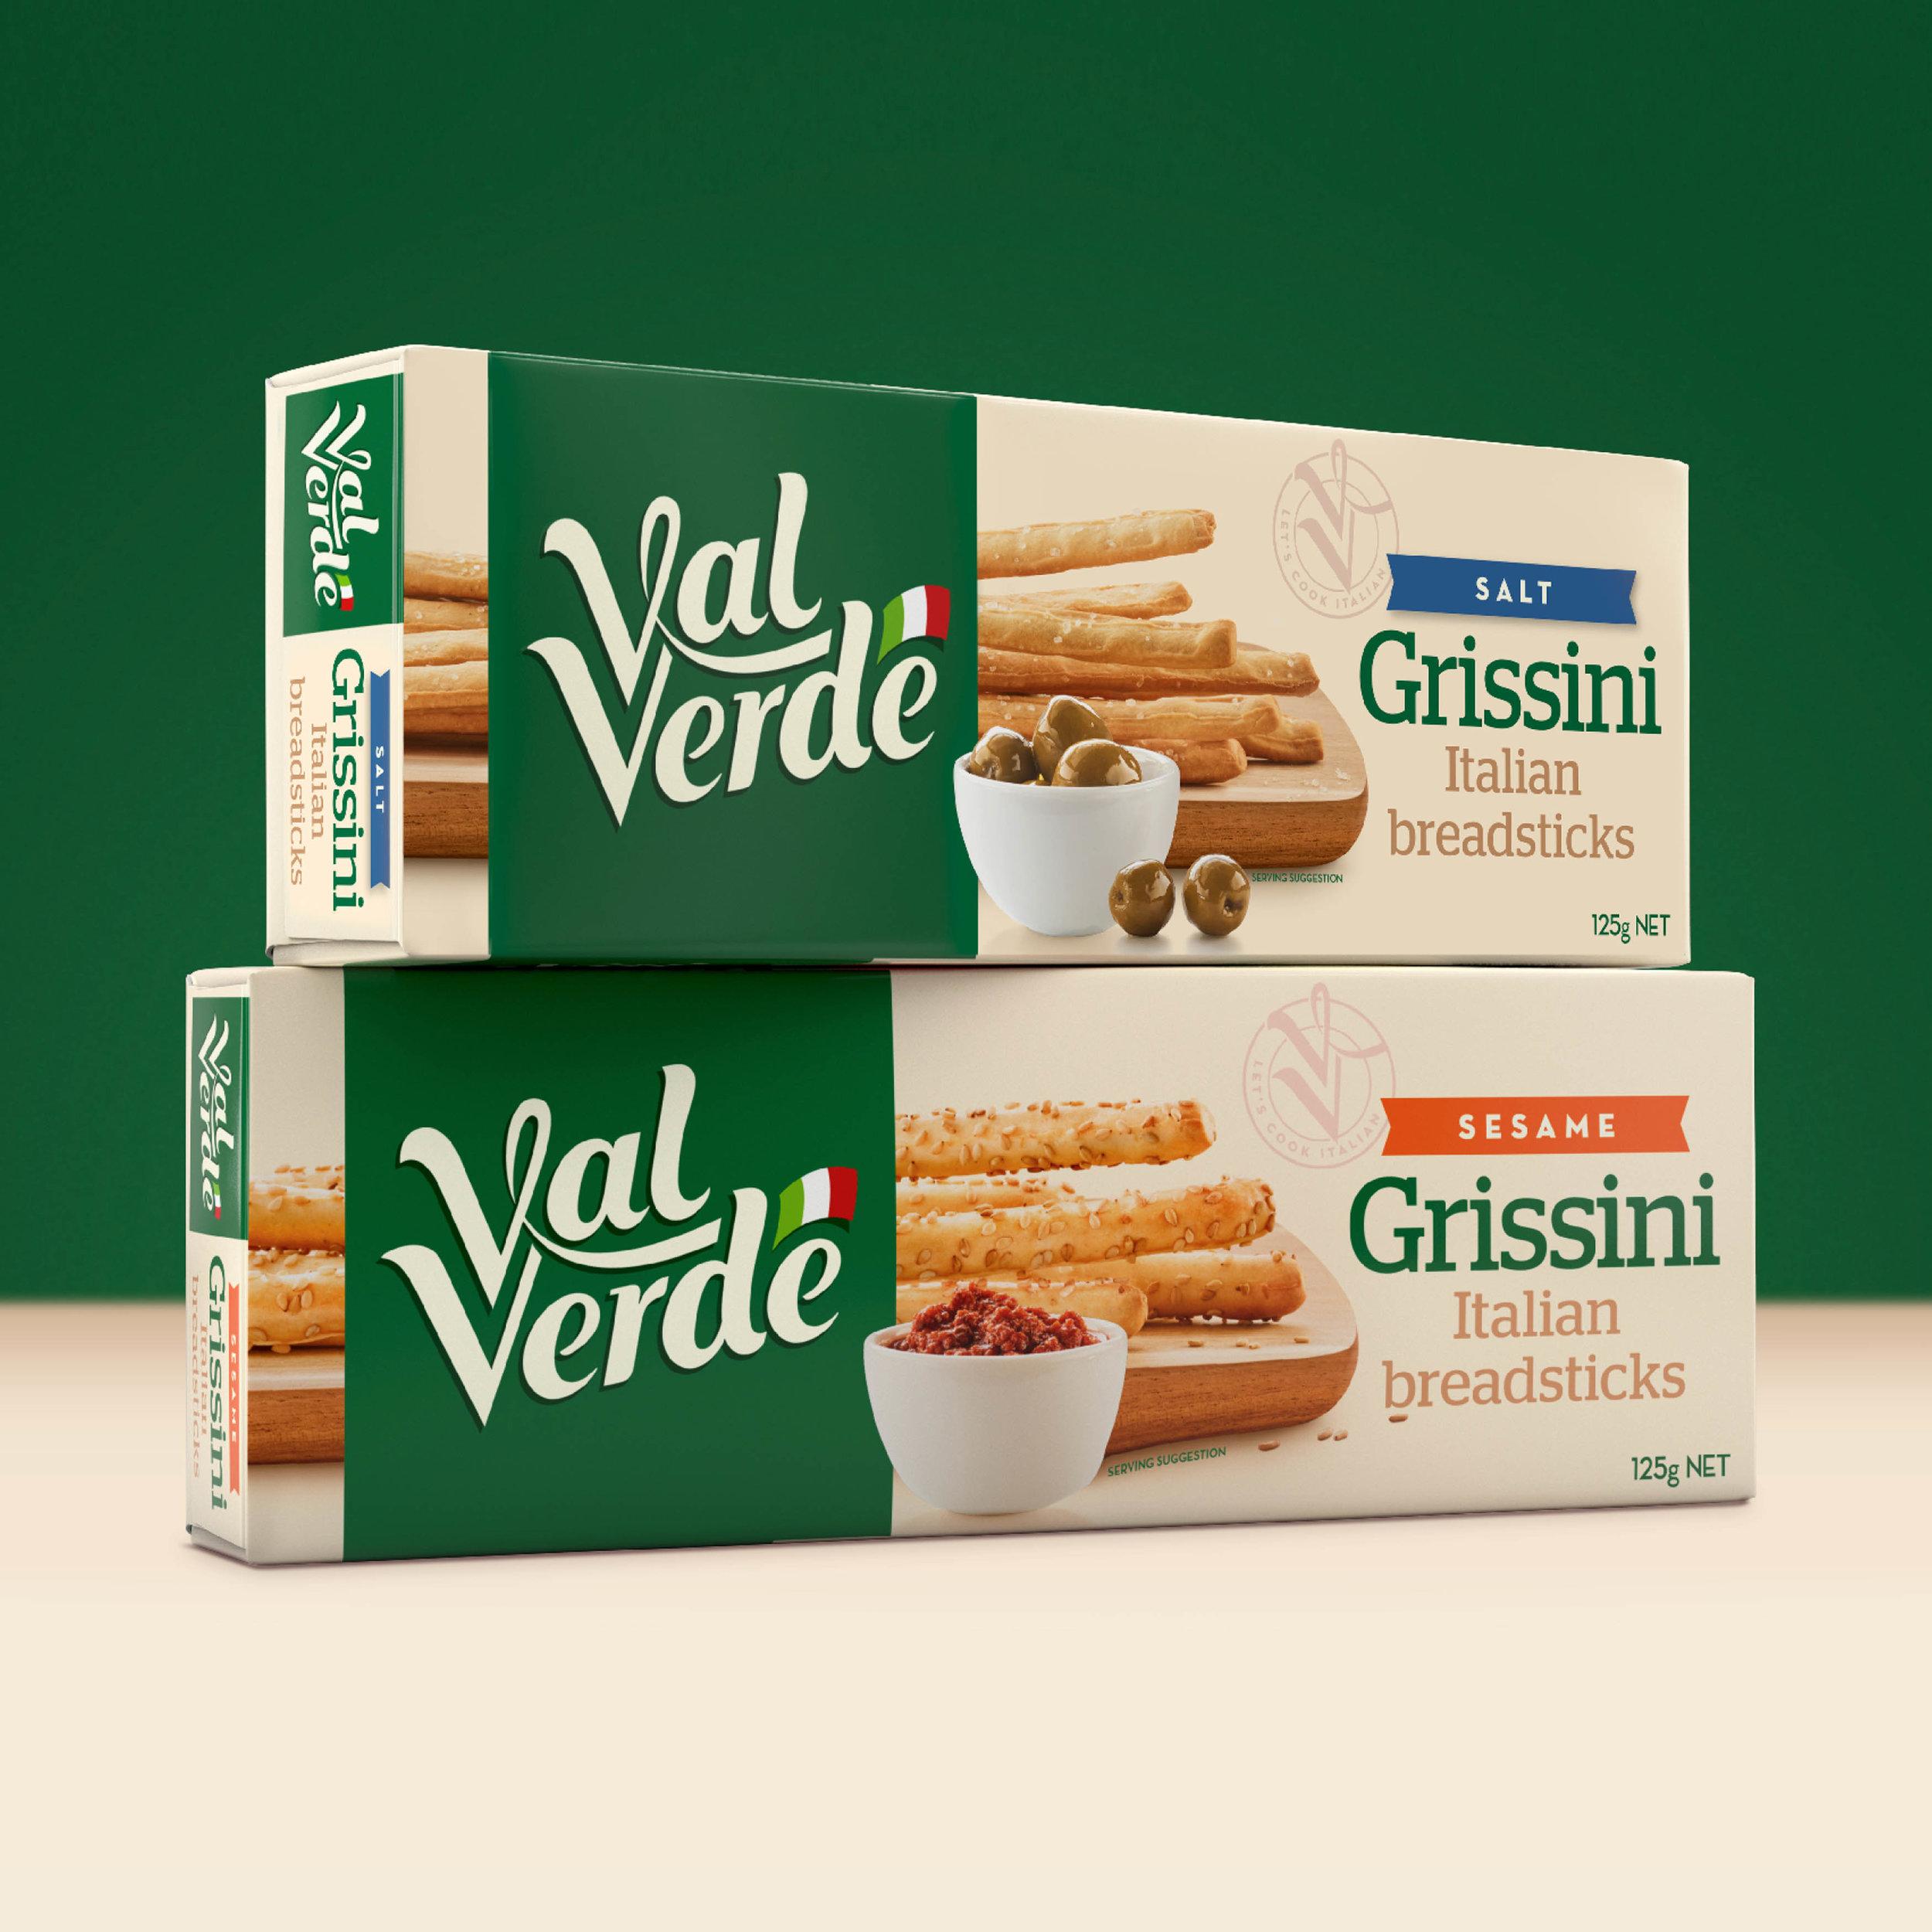 Val-Verde_Grissini copy.jpg